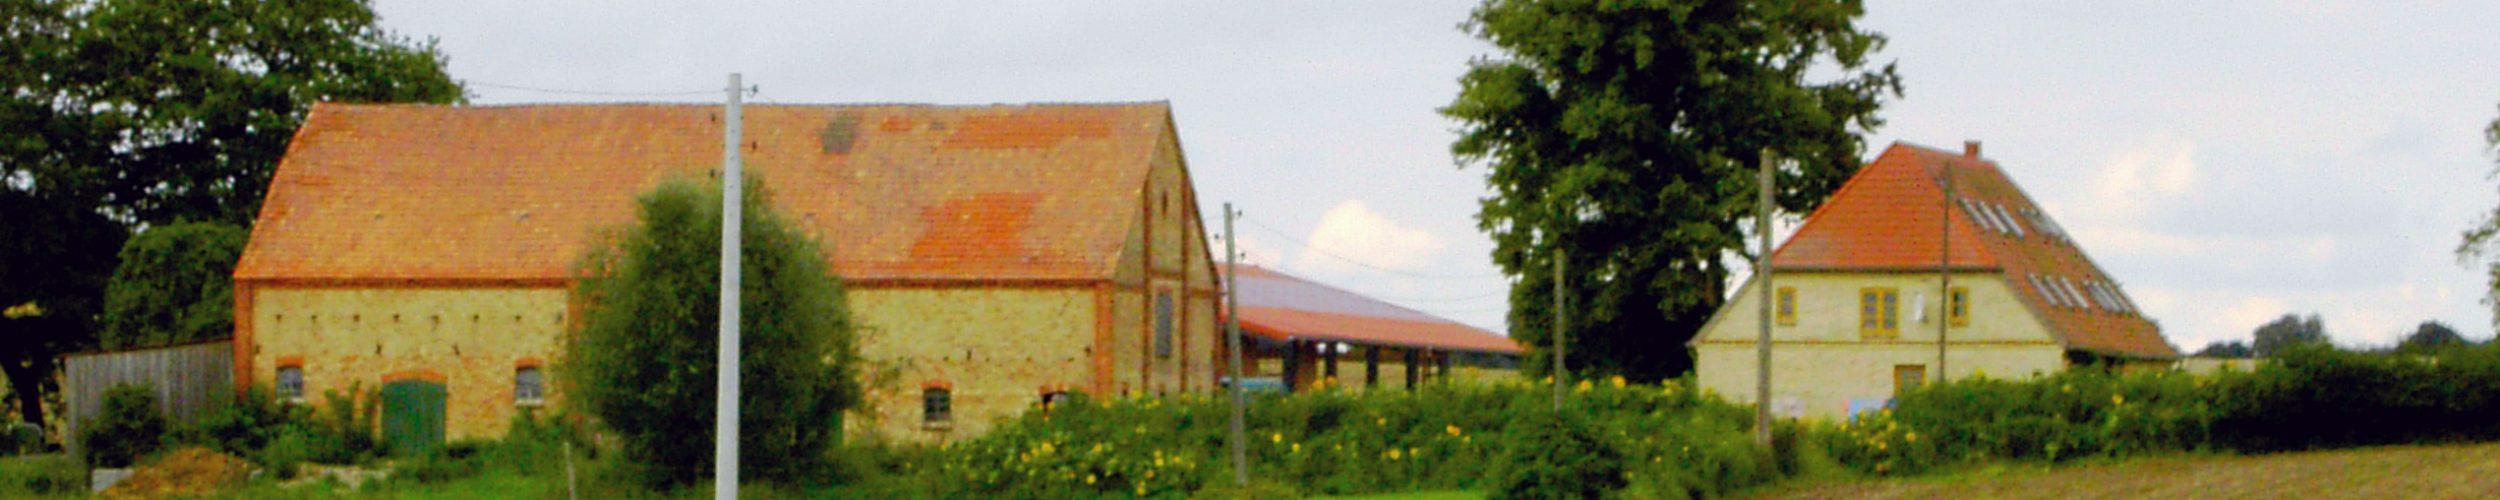 Sturmhof